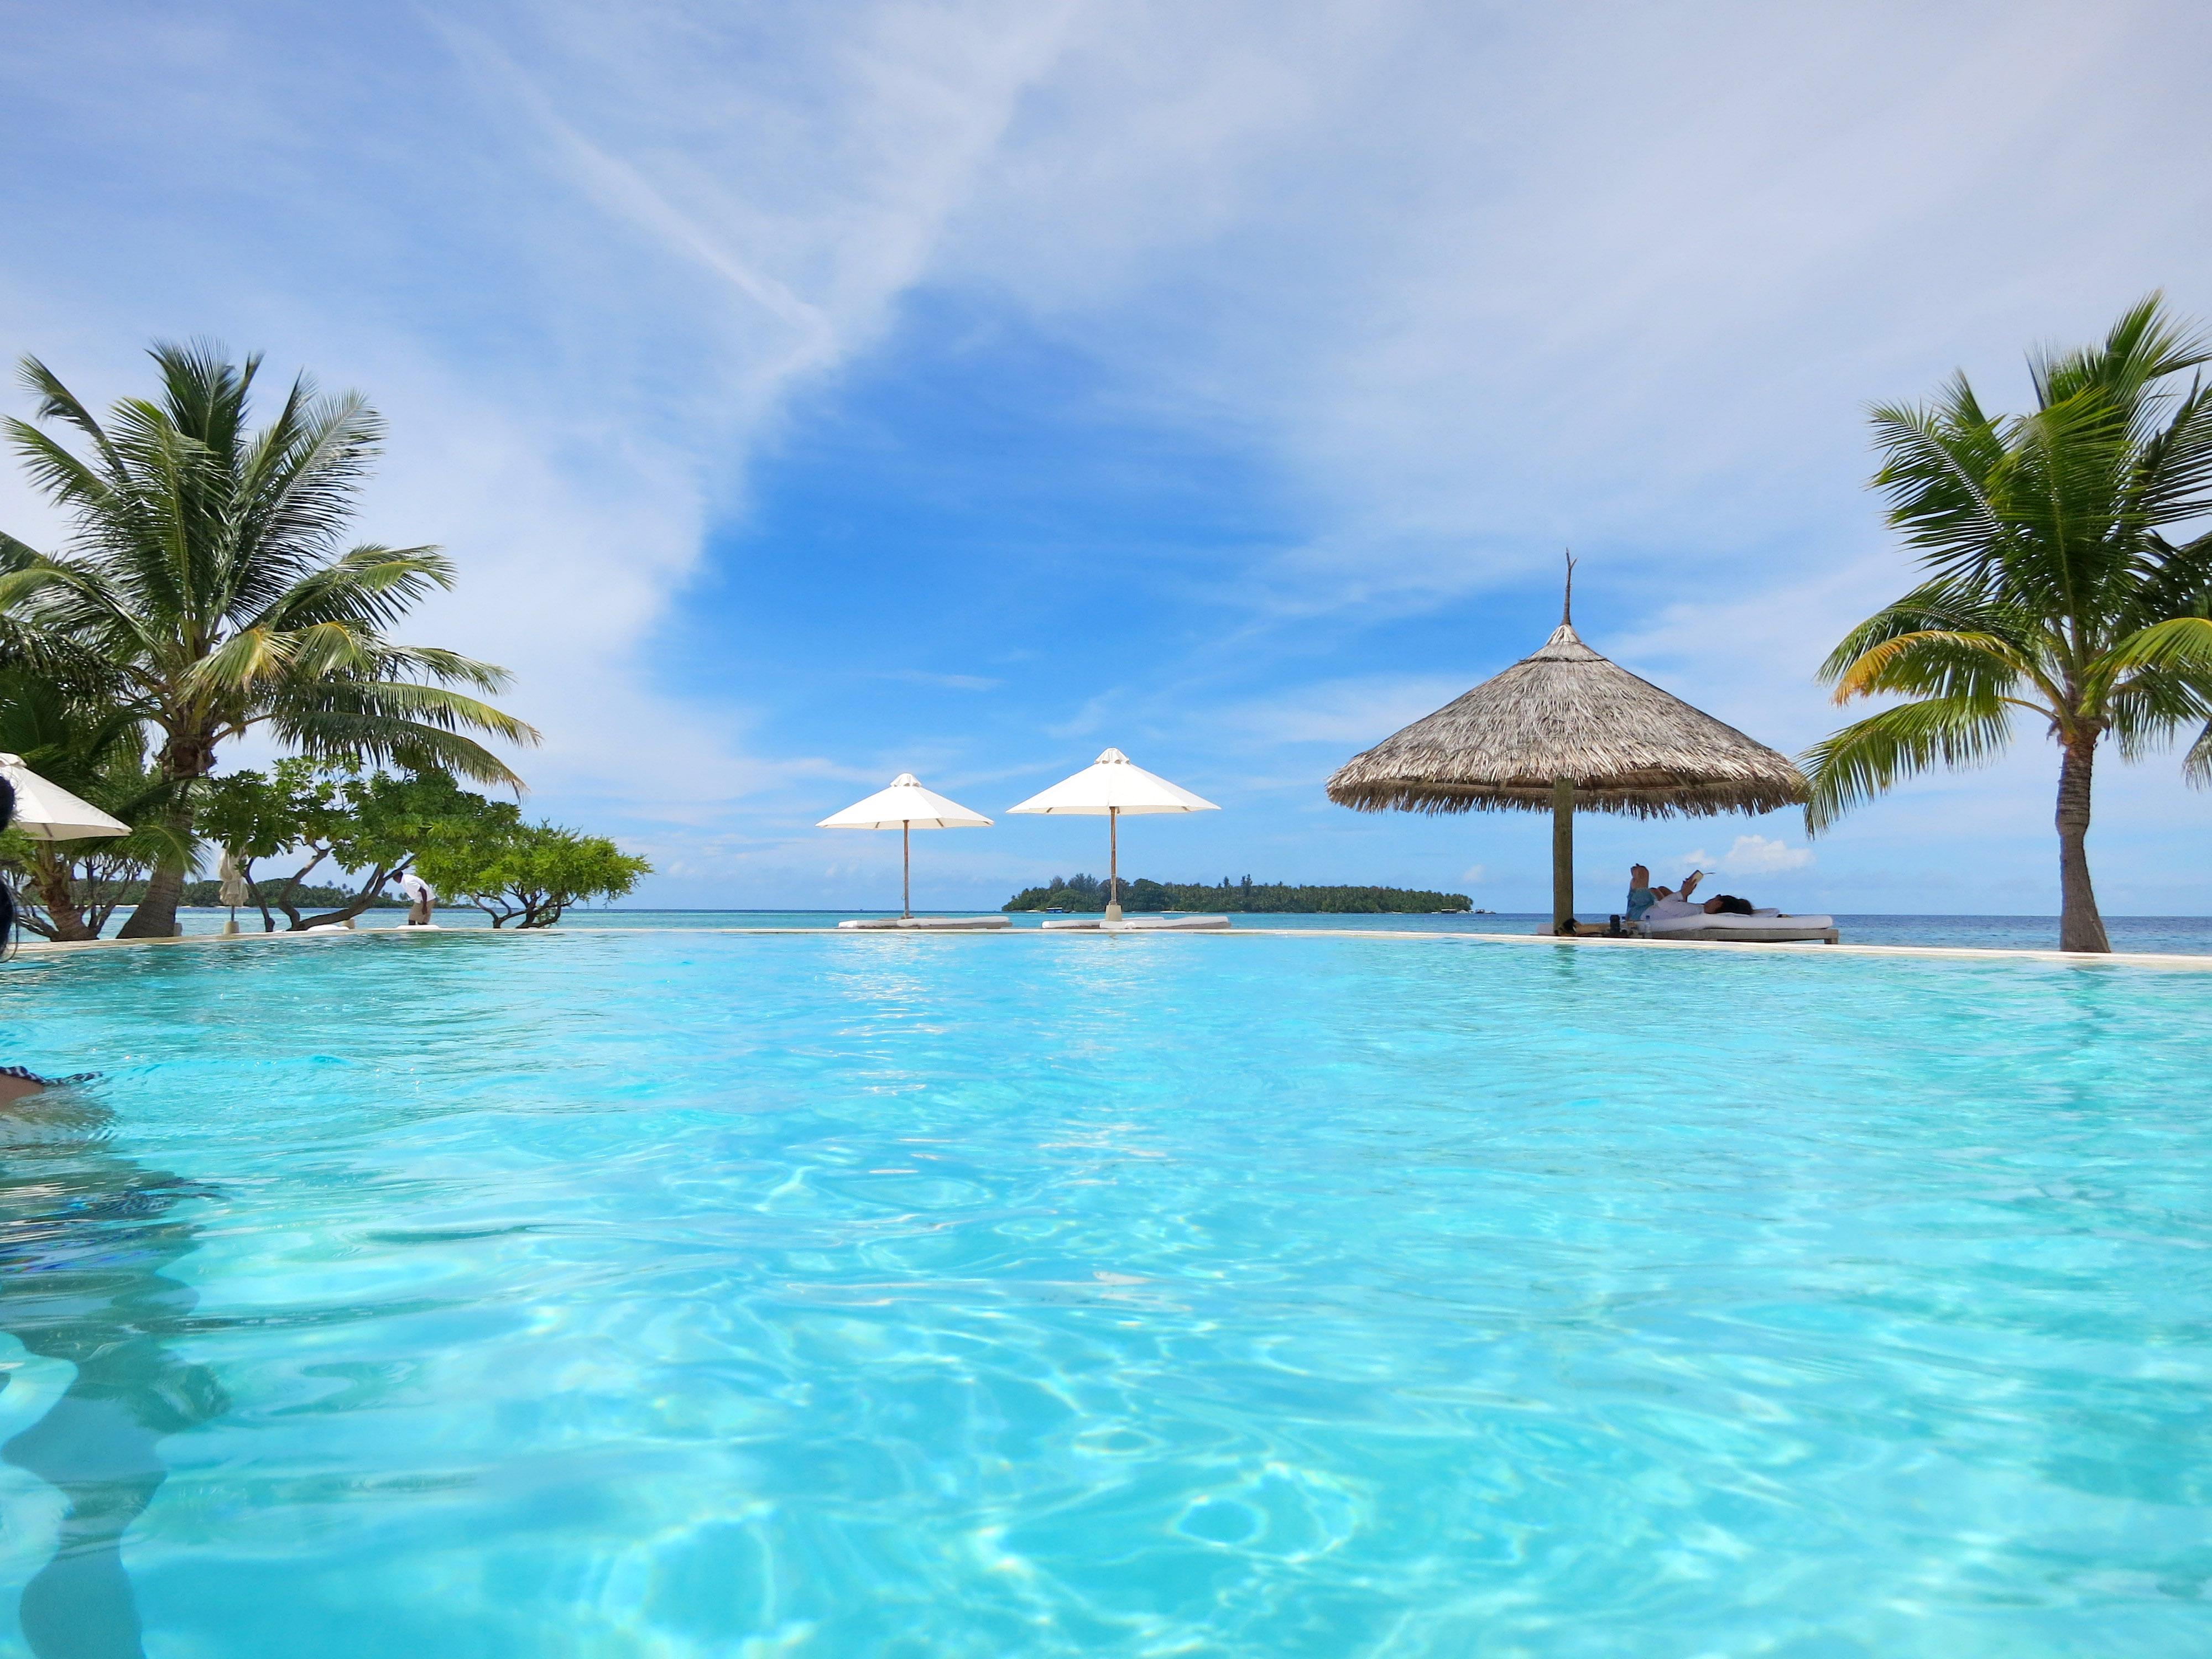 2013 Maldives And Singapore Trip